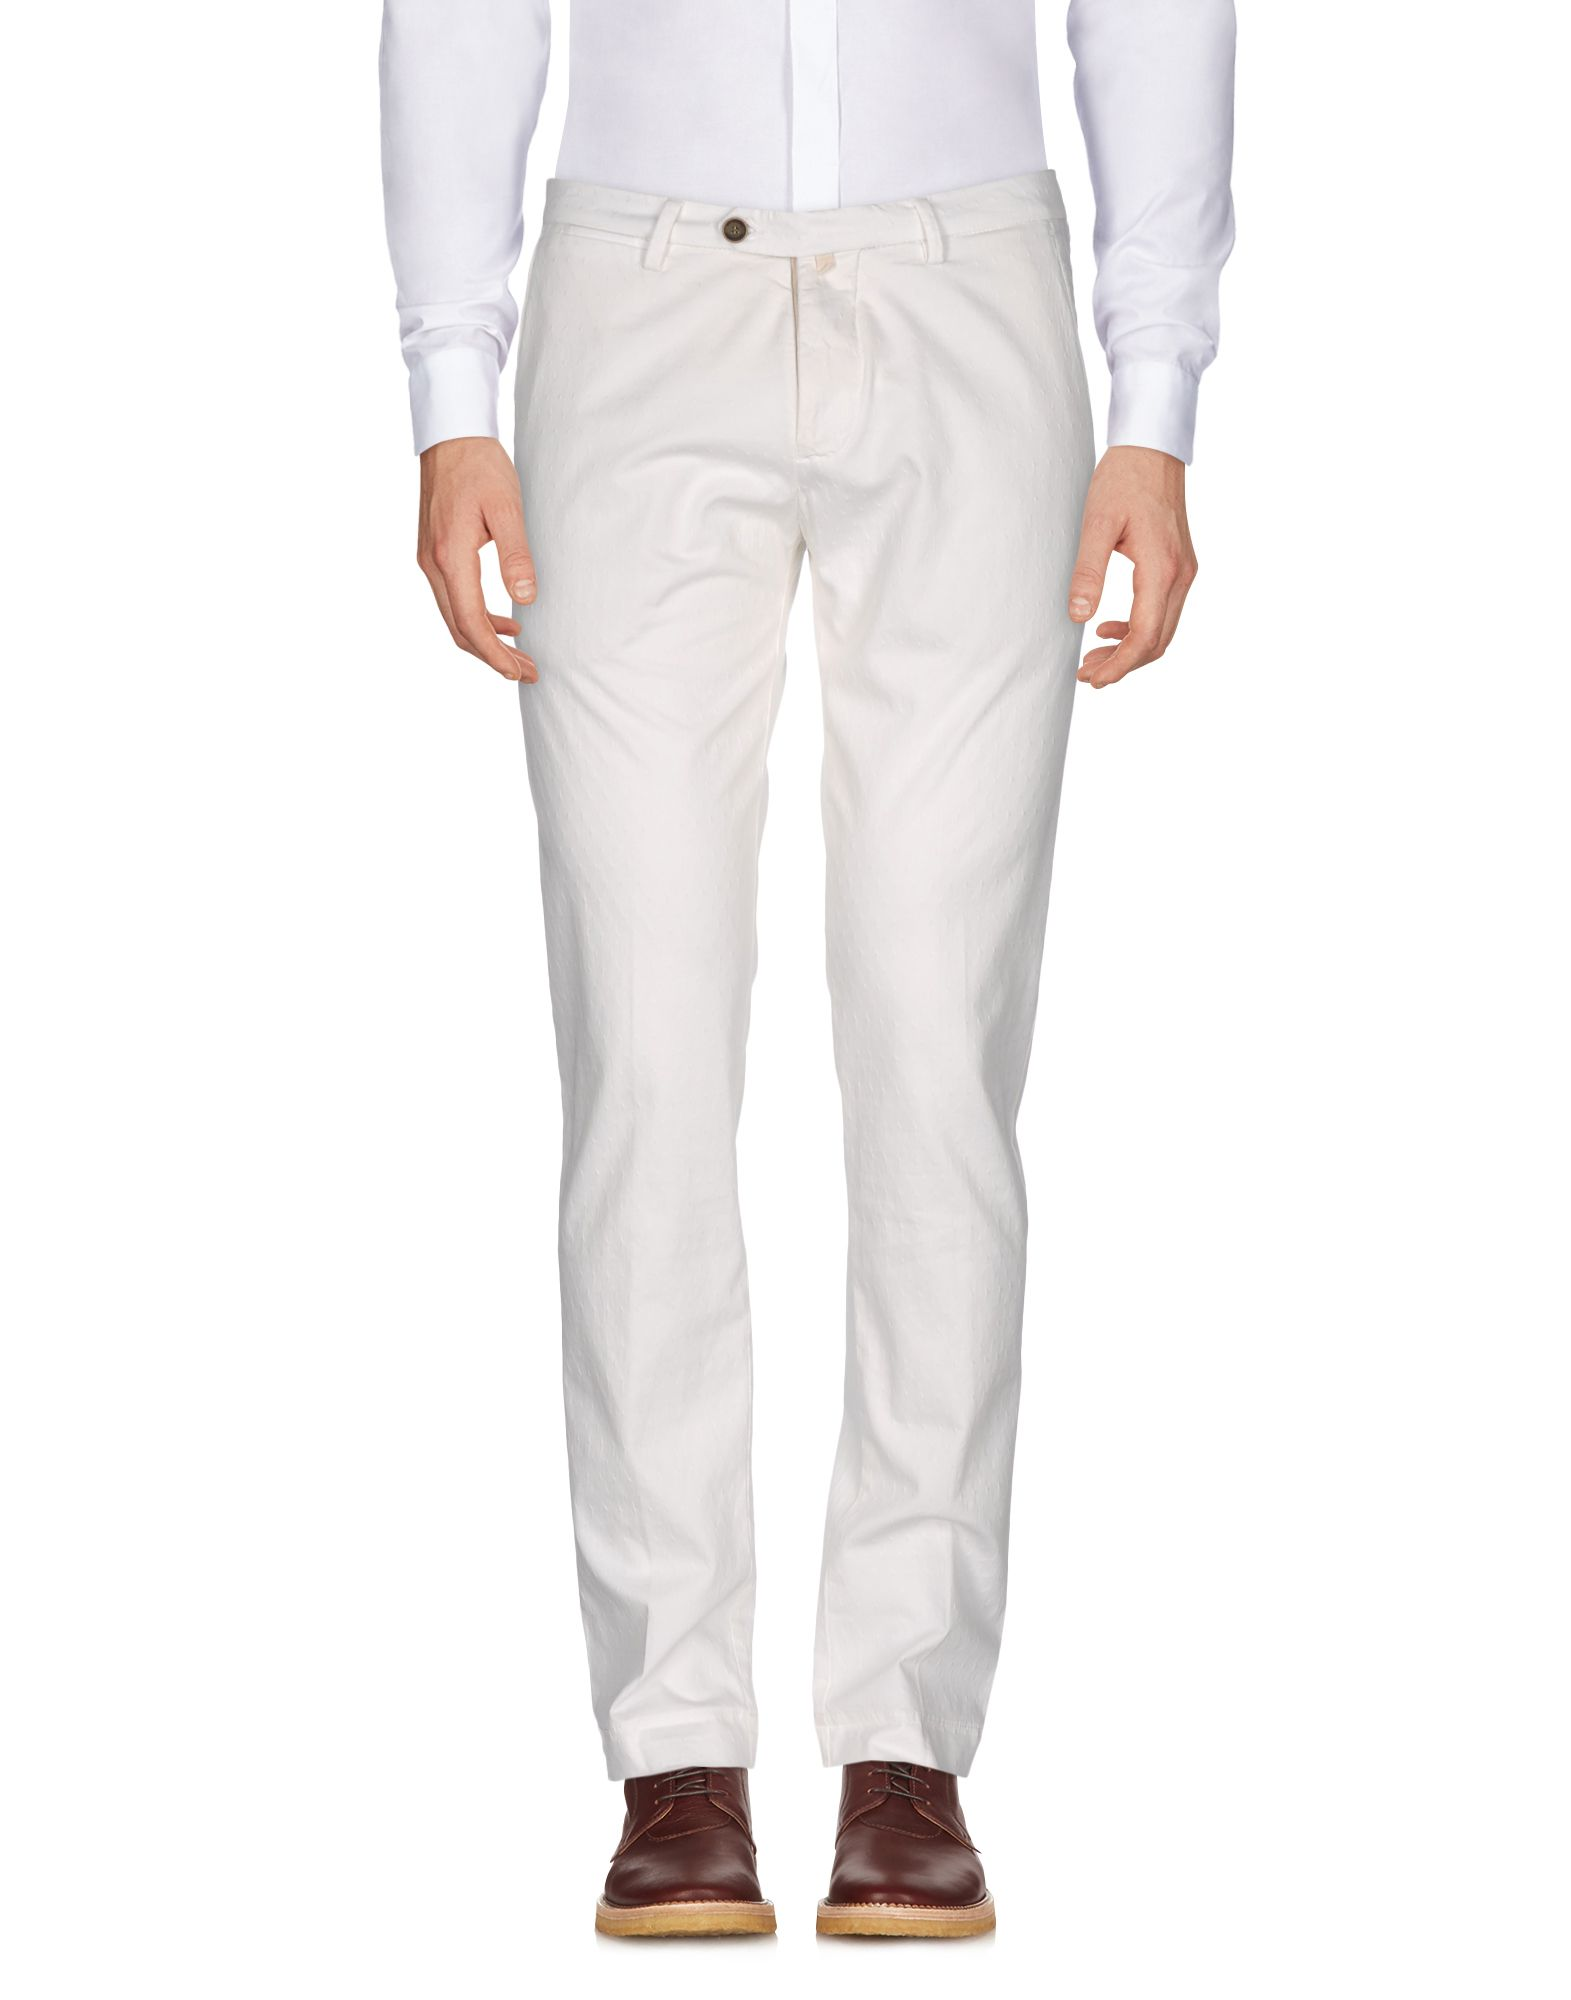 Pantalone B Settecento Uomo - Acquista online su